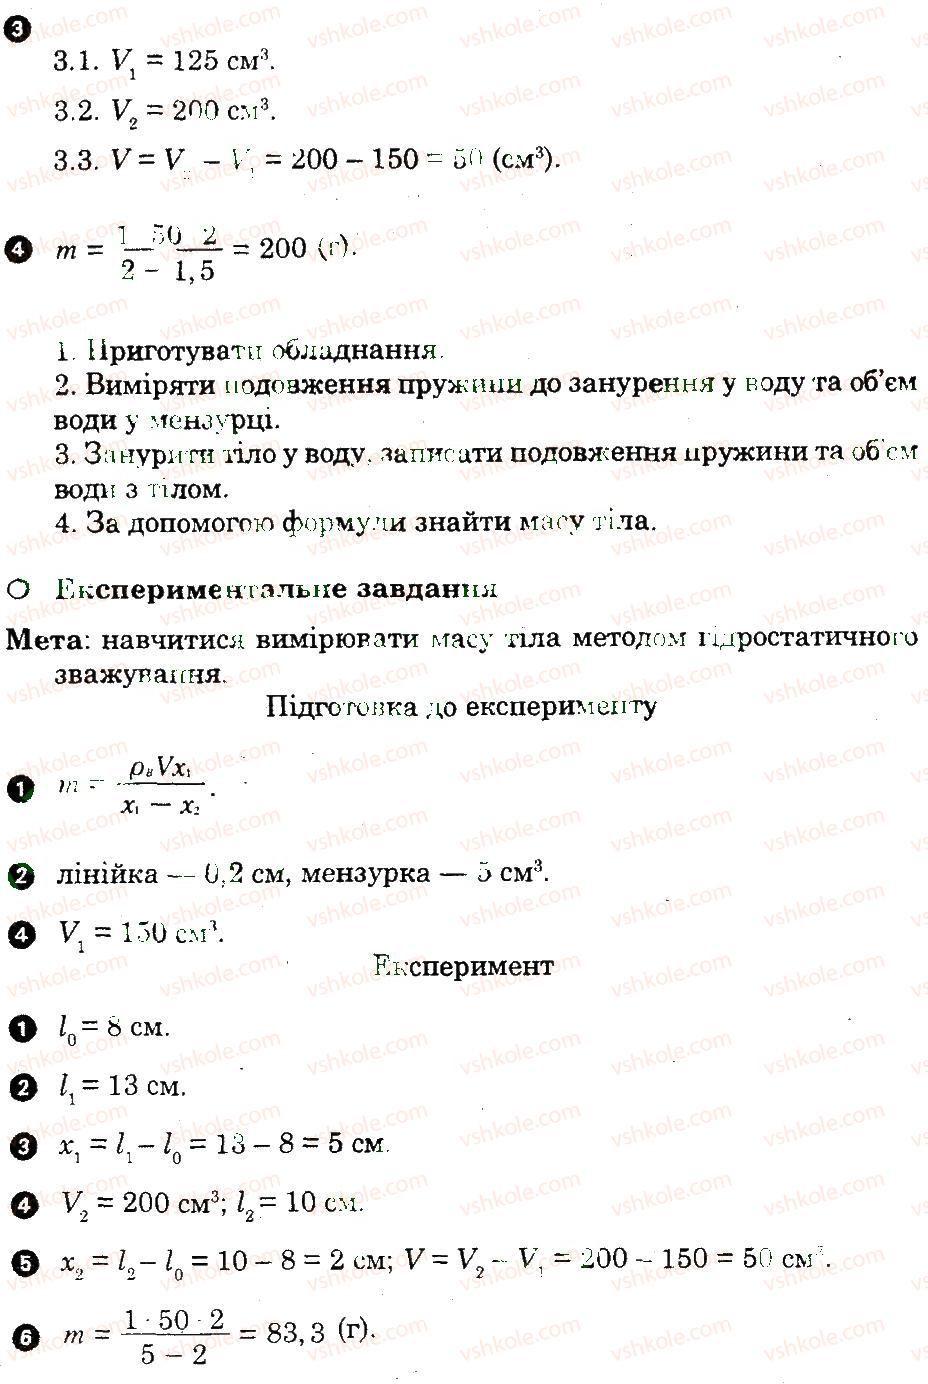 8-fizika-fya-bozhinova-oo-kiryuhina-2010-zoshit-dlya-laboratornih-robit--laboratorni-roboti-9-rnd1955.jpg